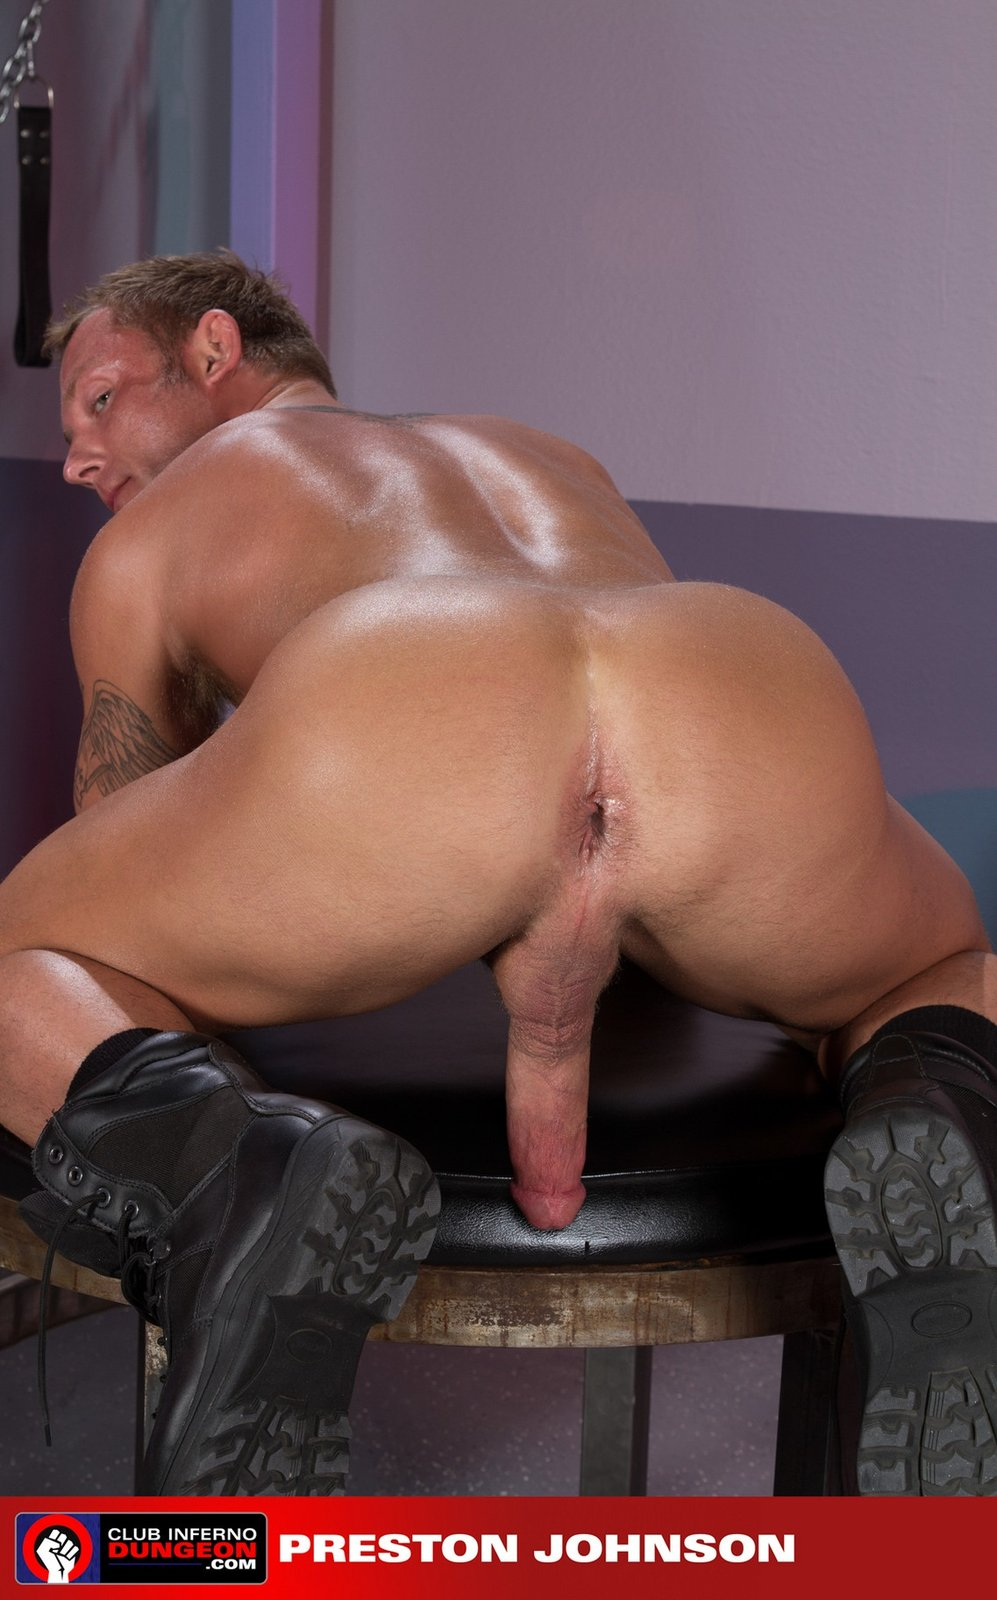 Preston Johnson porno gay